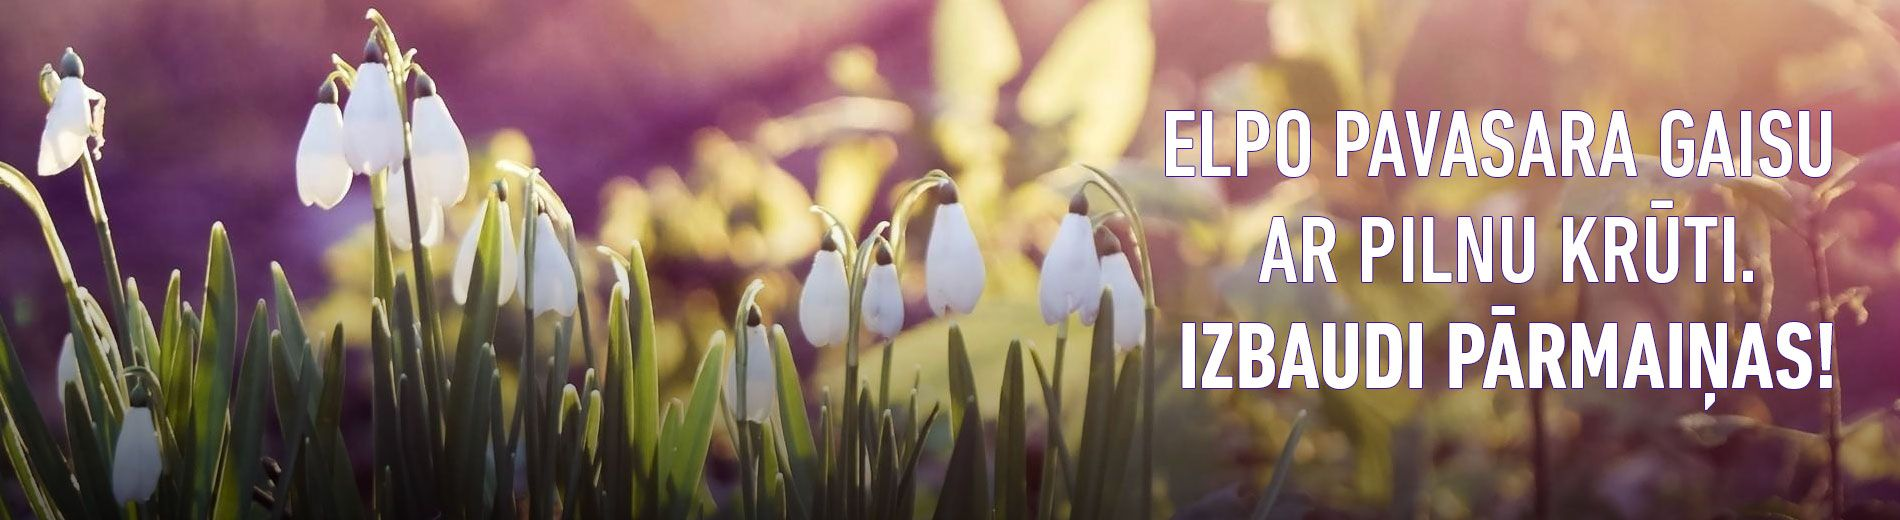 e-cigaretes, e-šķidrumi, elektroniskās cigaretes, e-cigaretes šķidrumi, pavasaris, pavasara akcija, airpuf